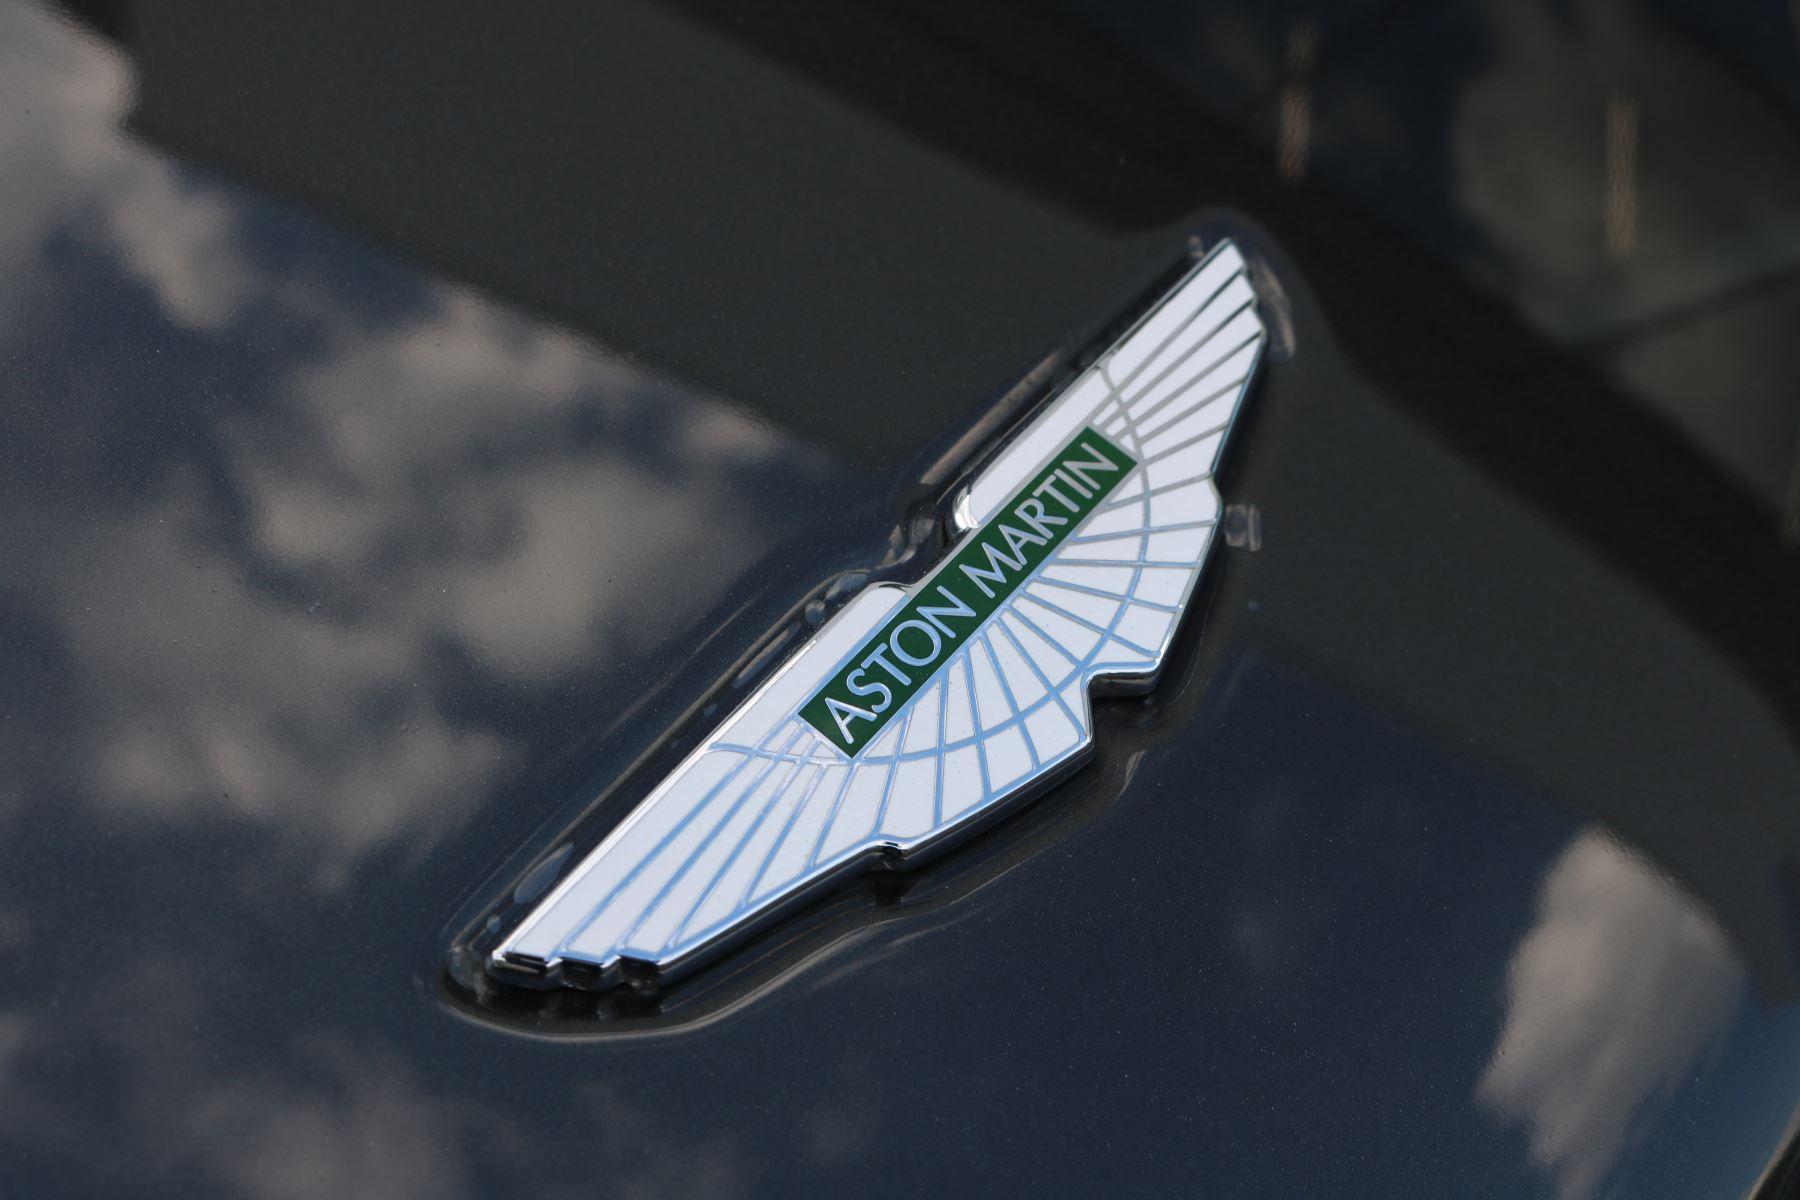 Aston Martin Virage V12 2dr Volante Touchtronic image 12